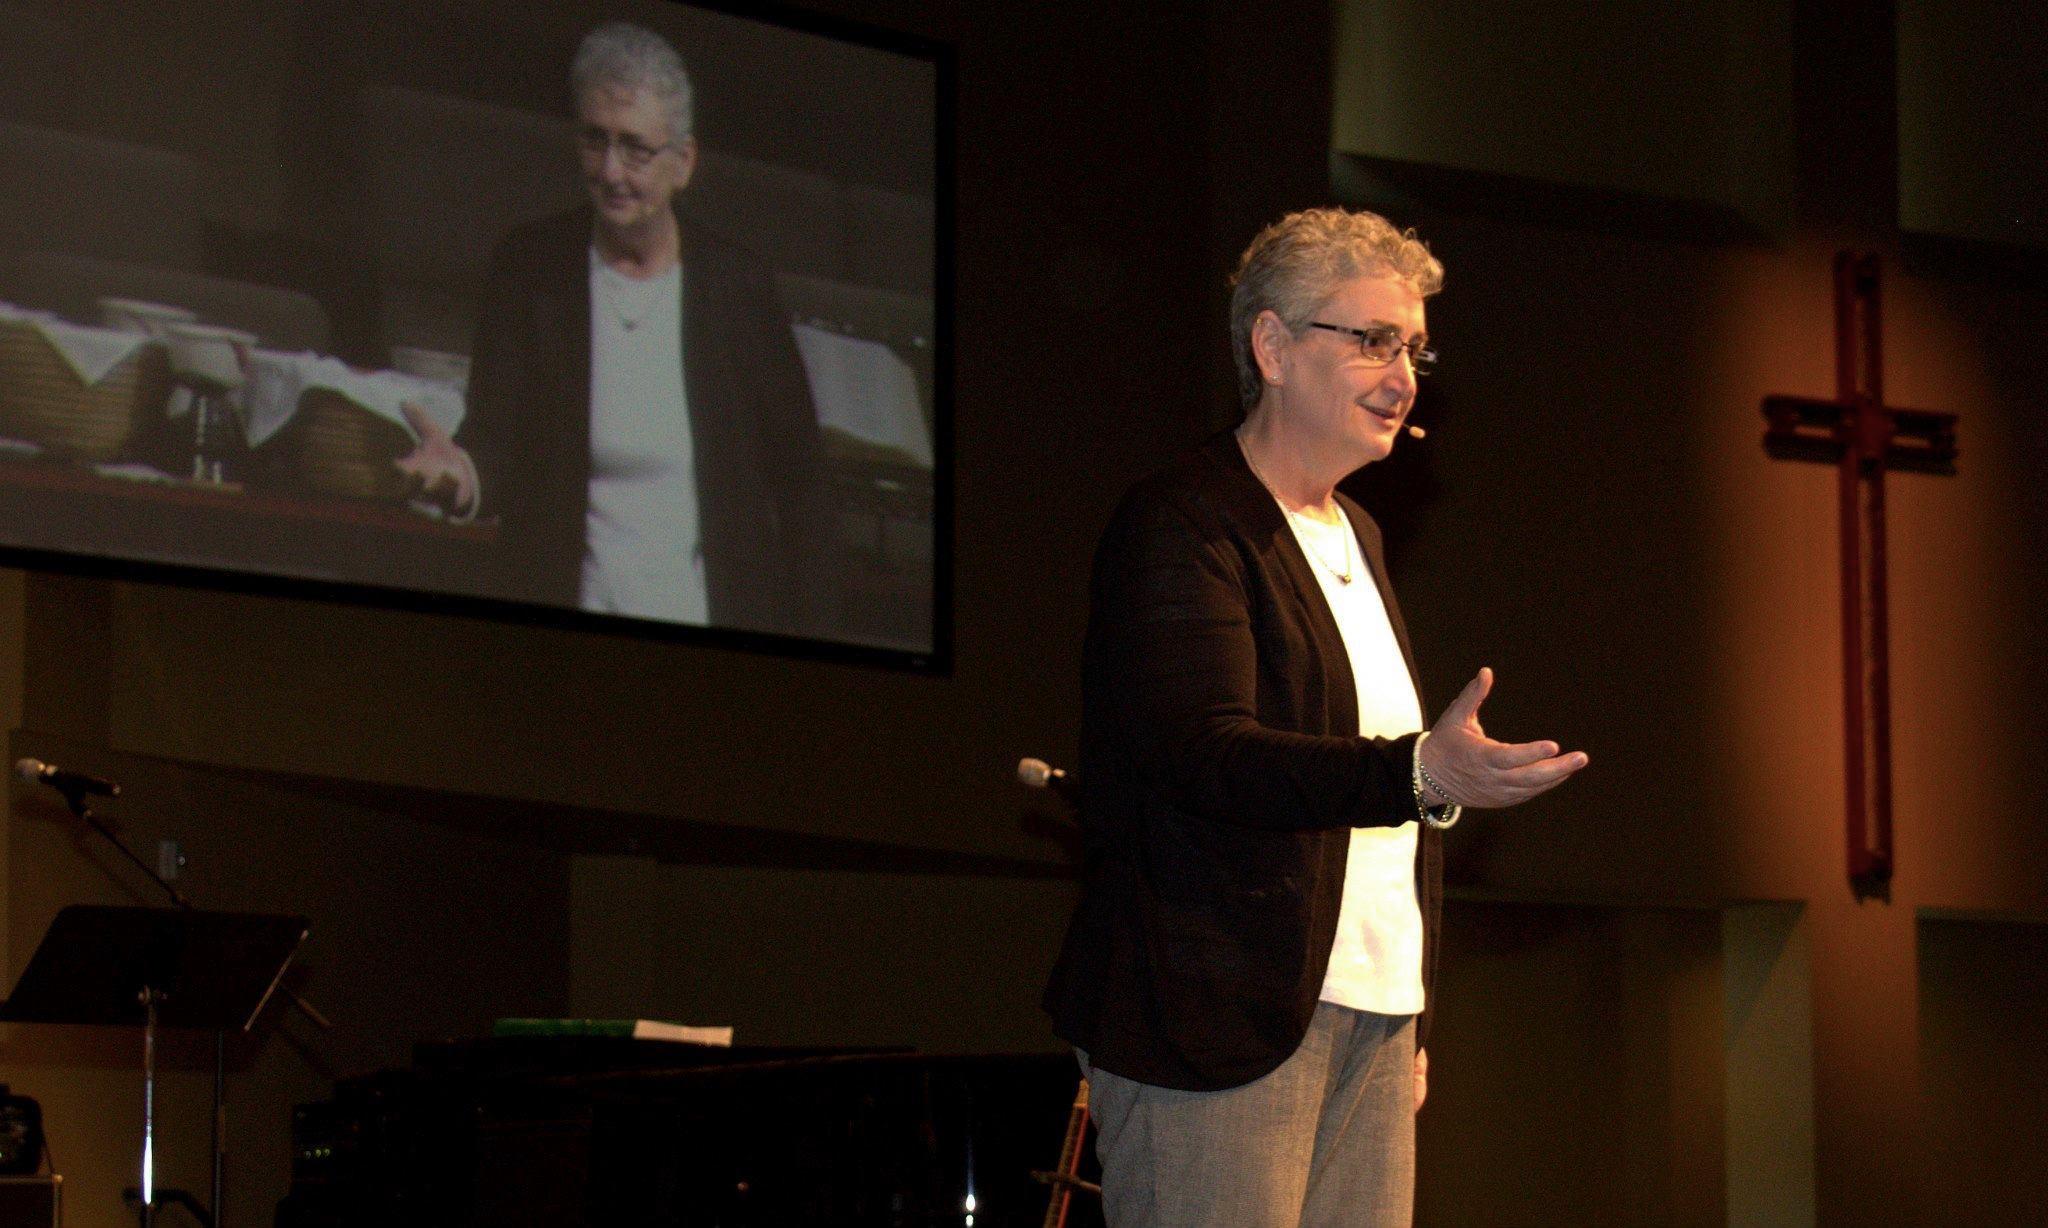 Karyn Wiseman. Photo courtesy of Karyn Wiseman.